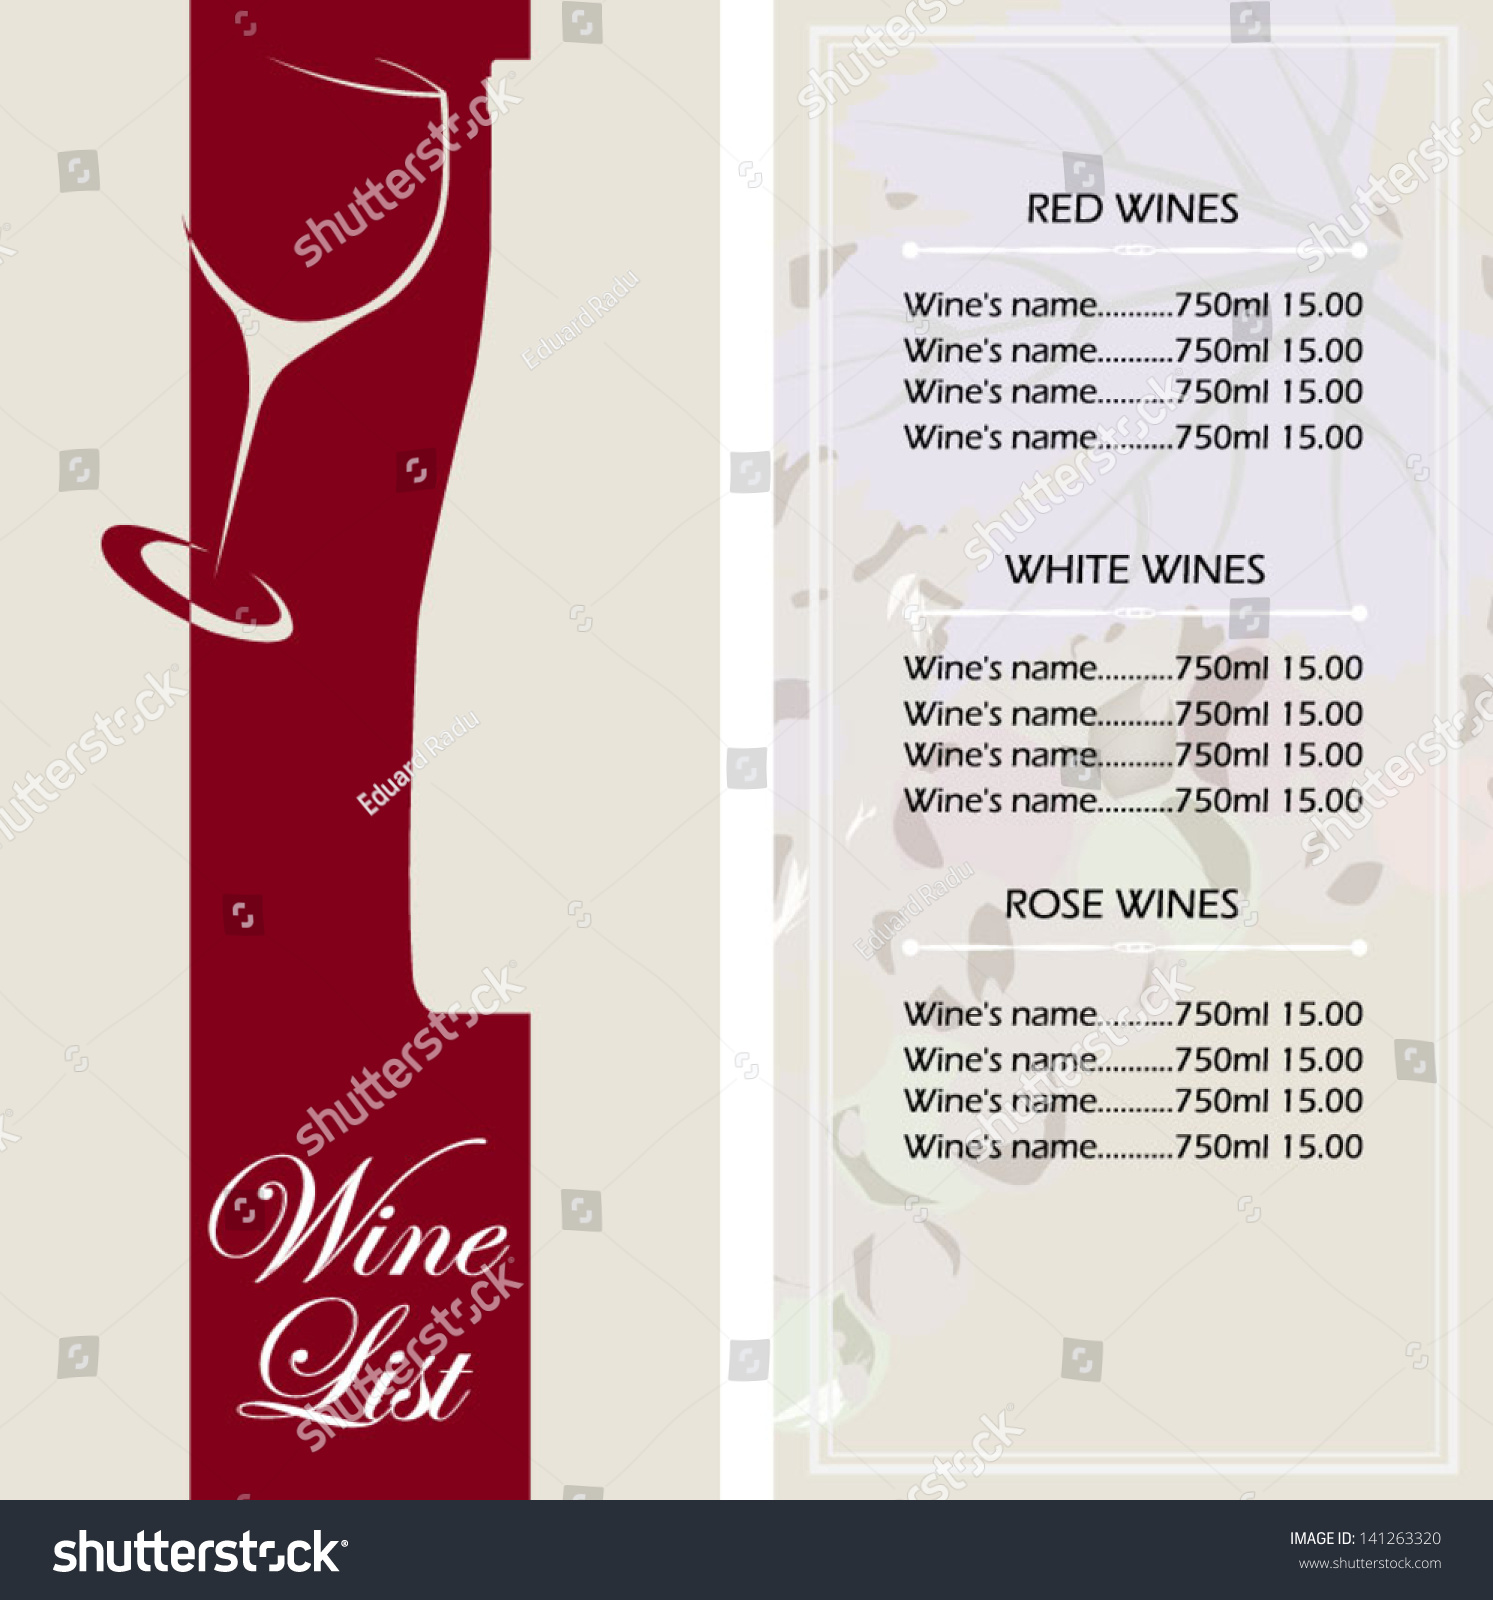 template for wine list stock vector illustration 141263320 shutterstock. Black Bedroom Furniture Sets. Home Design Ideas